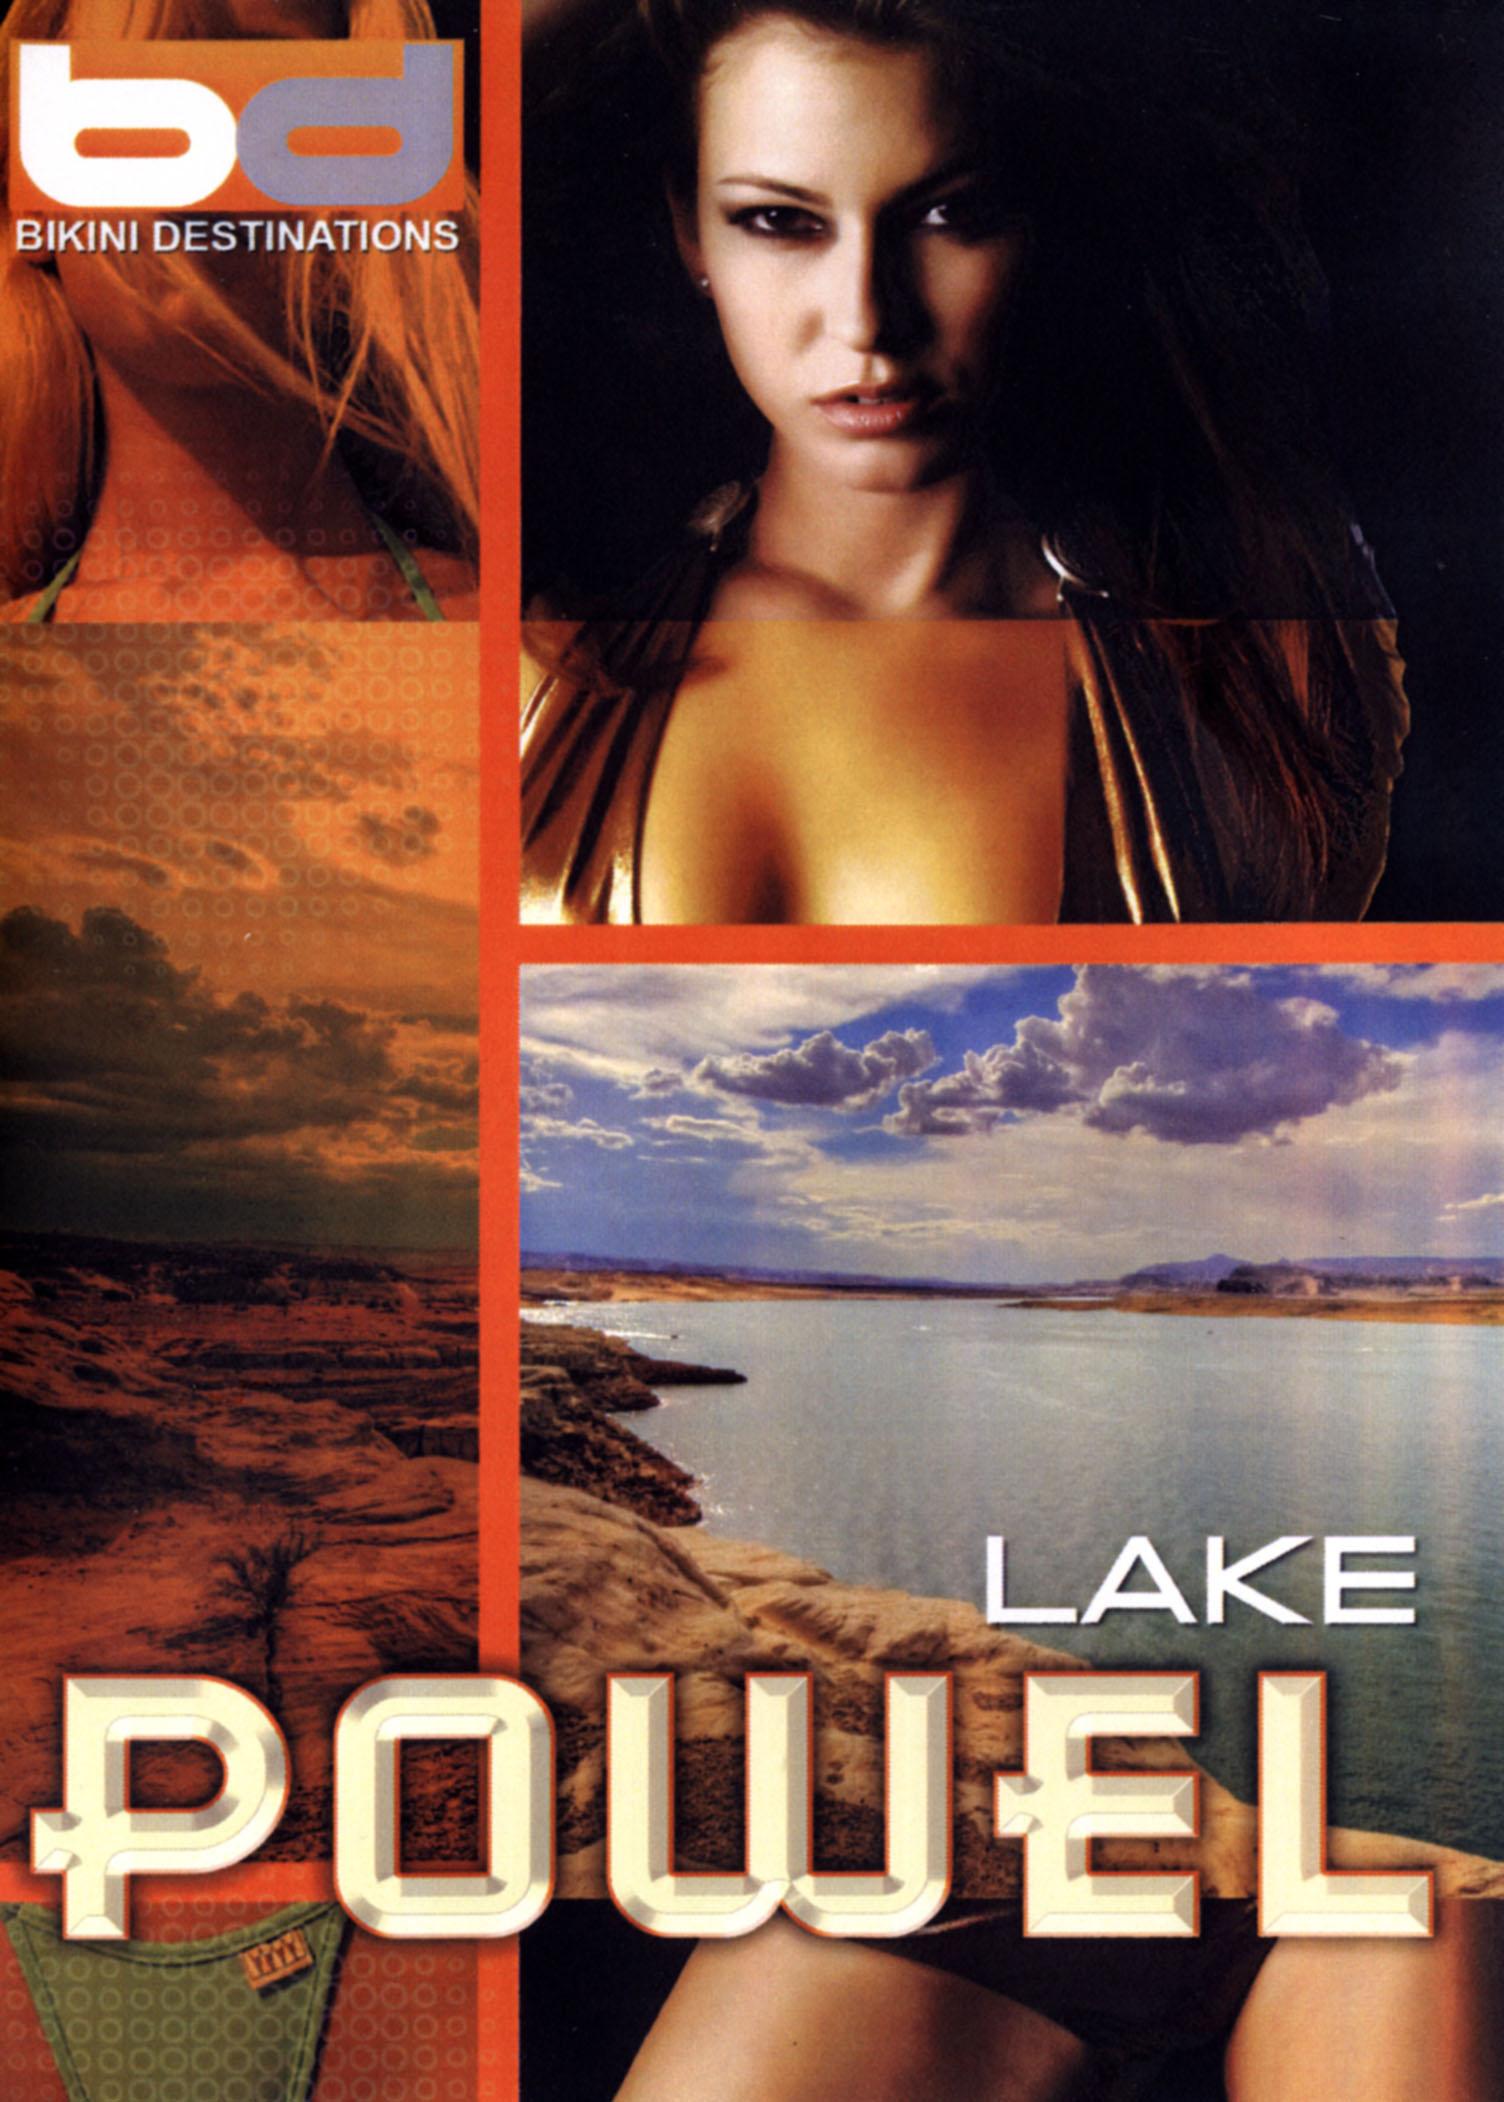 Bikini Destinations: Lake Powell